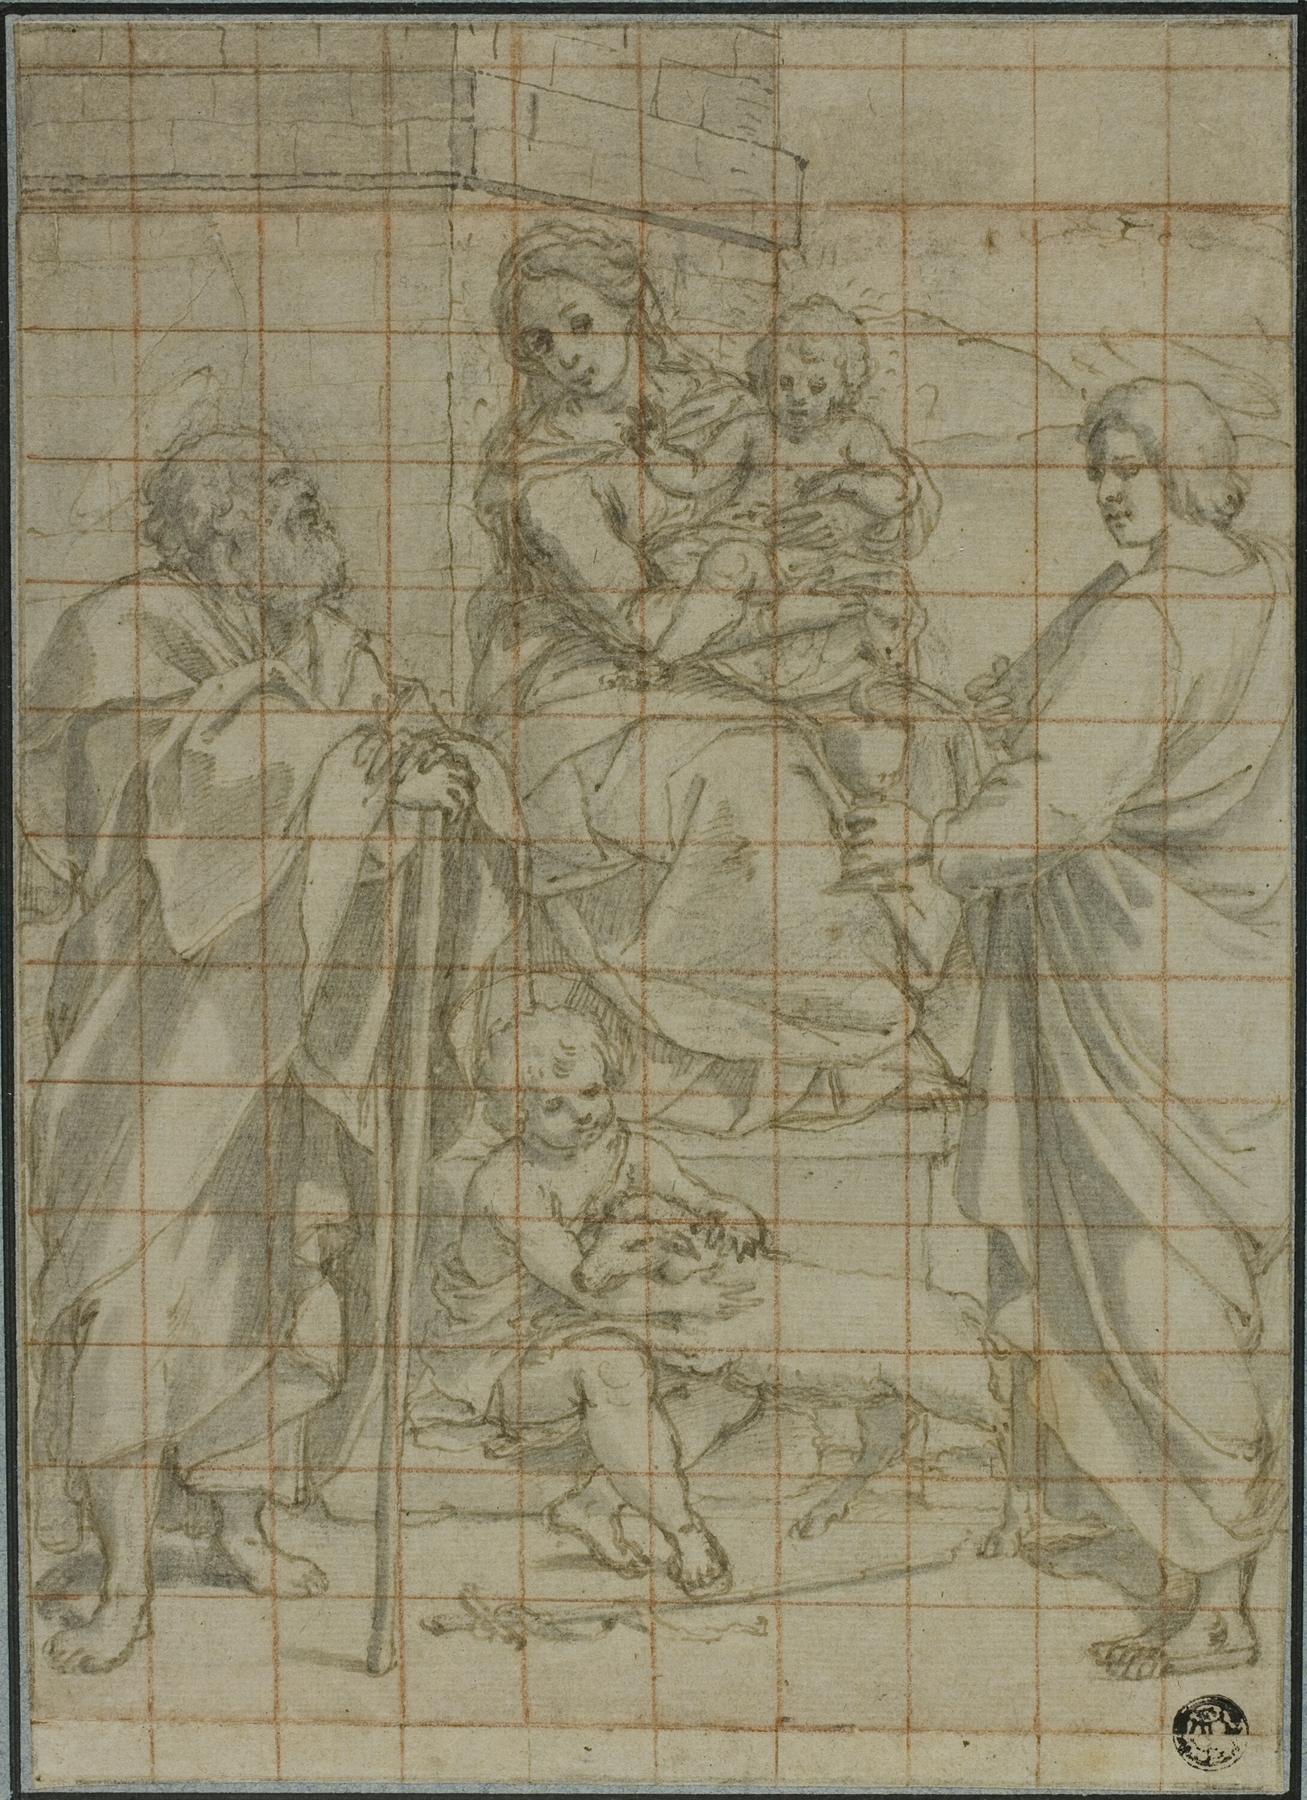 Bartolomeo Cesi - Holy Family with Saint John the Evangelist and the Infant John the Baptist